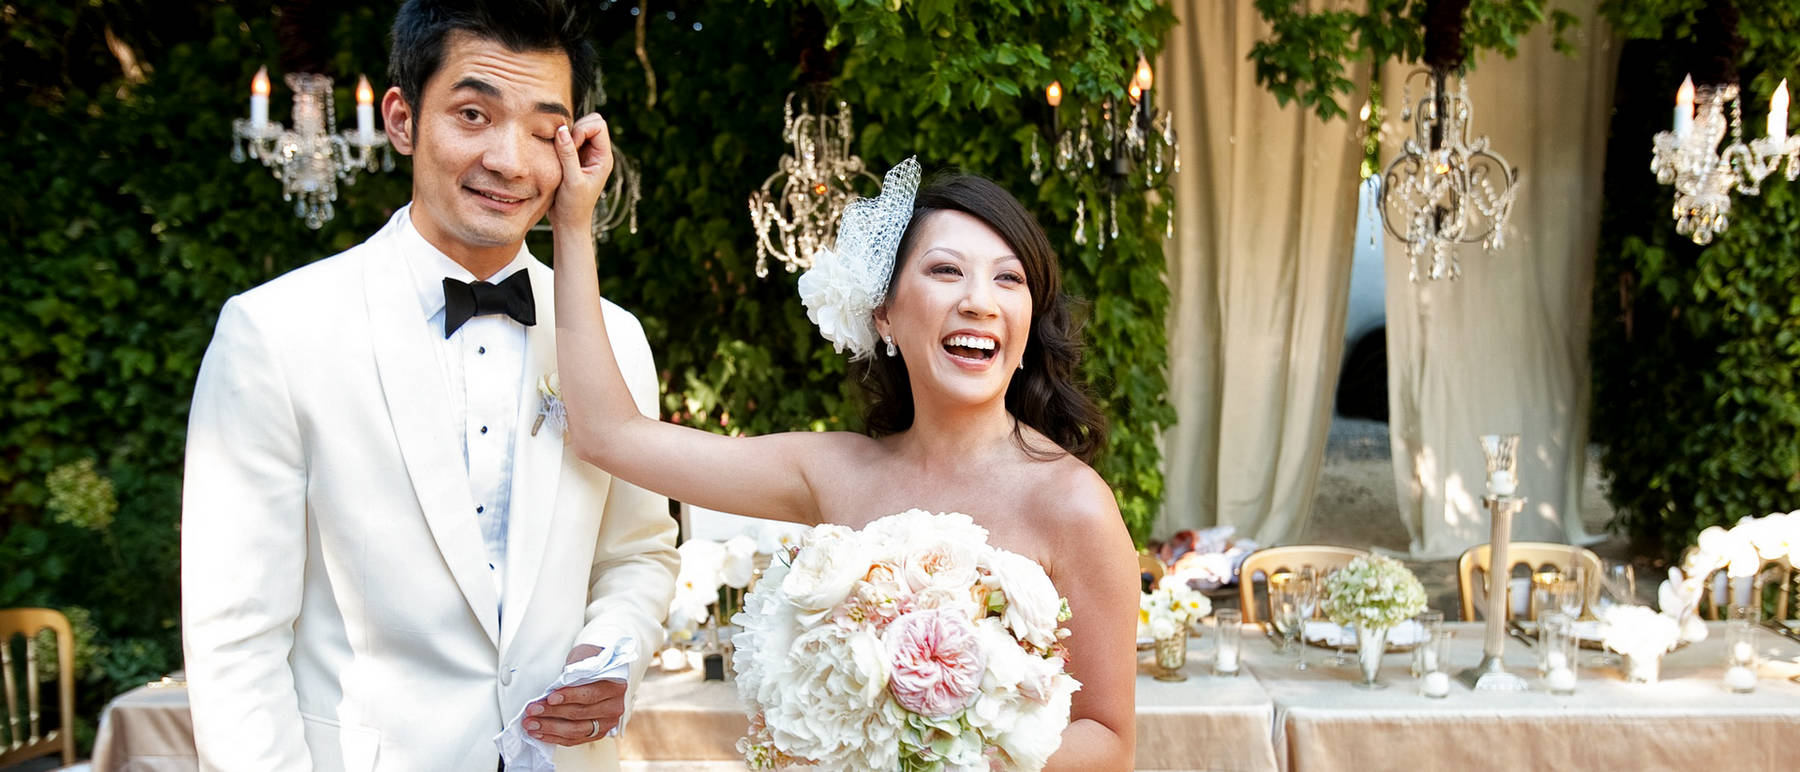 johnandjoseph-wedding-photographer-hz-slider-159